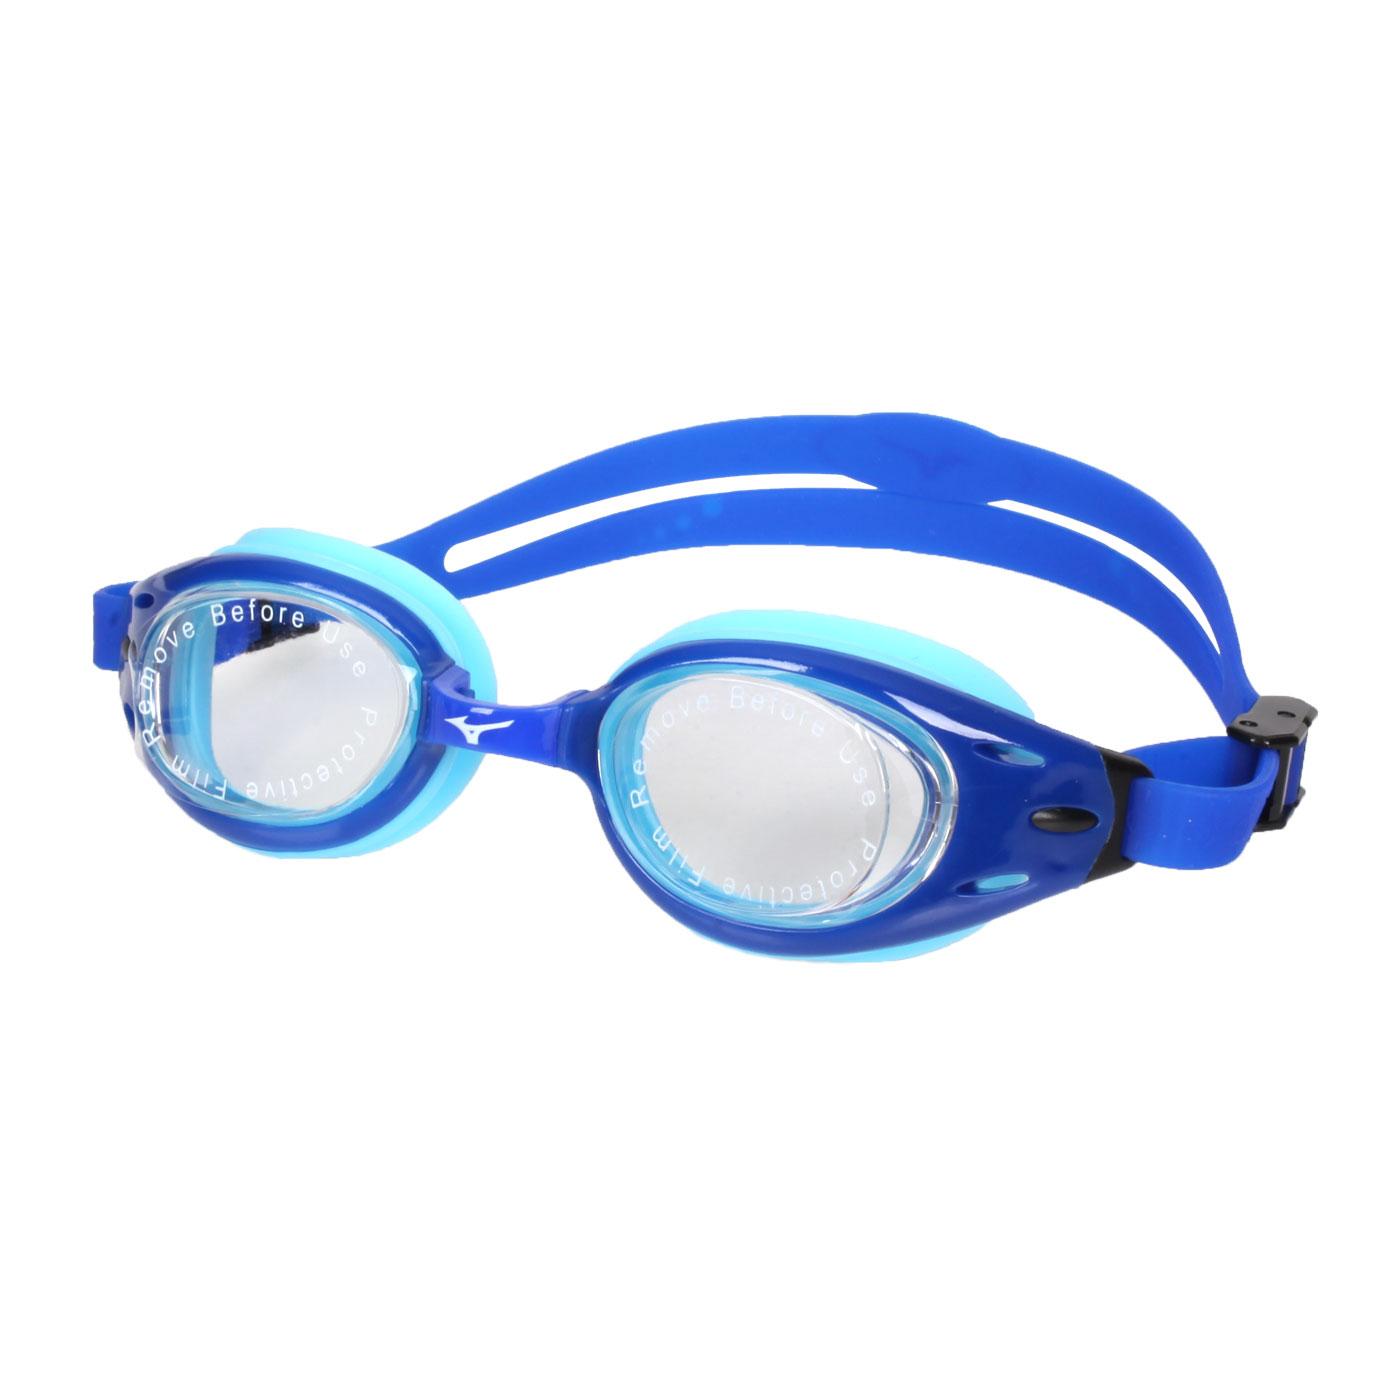 MIZUNO 兒童泳鏡  SWIMN3TF105000-27 - 藍水藍